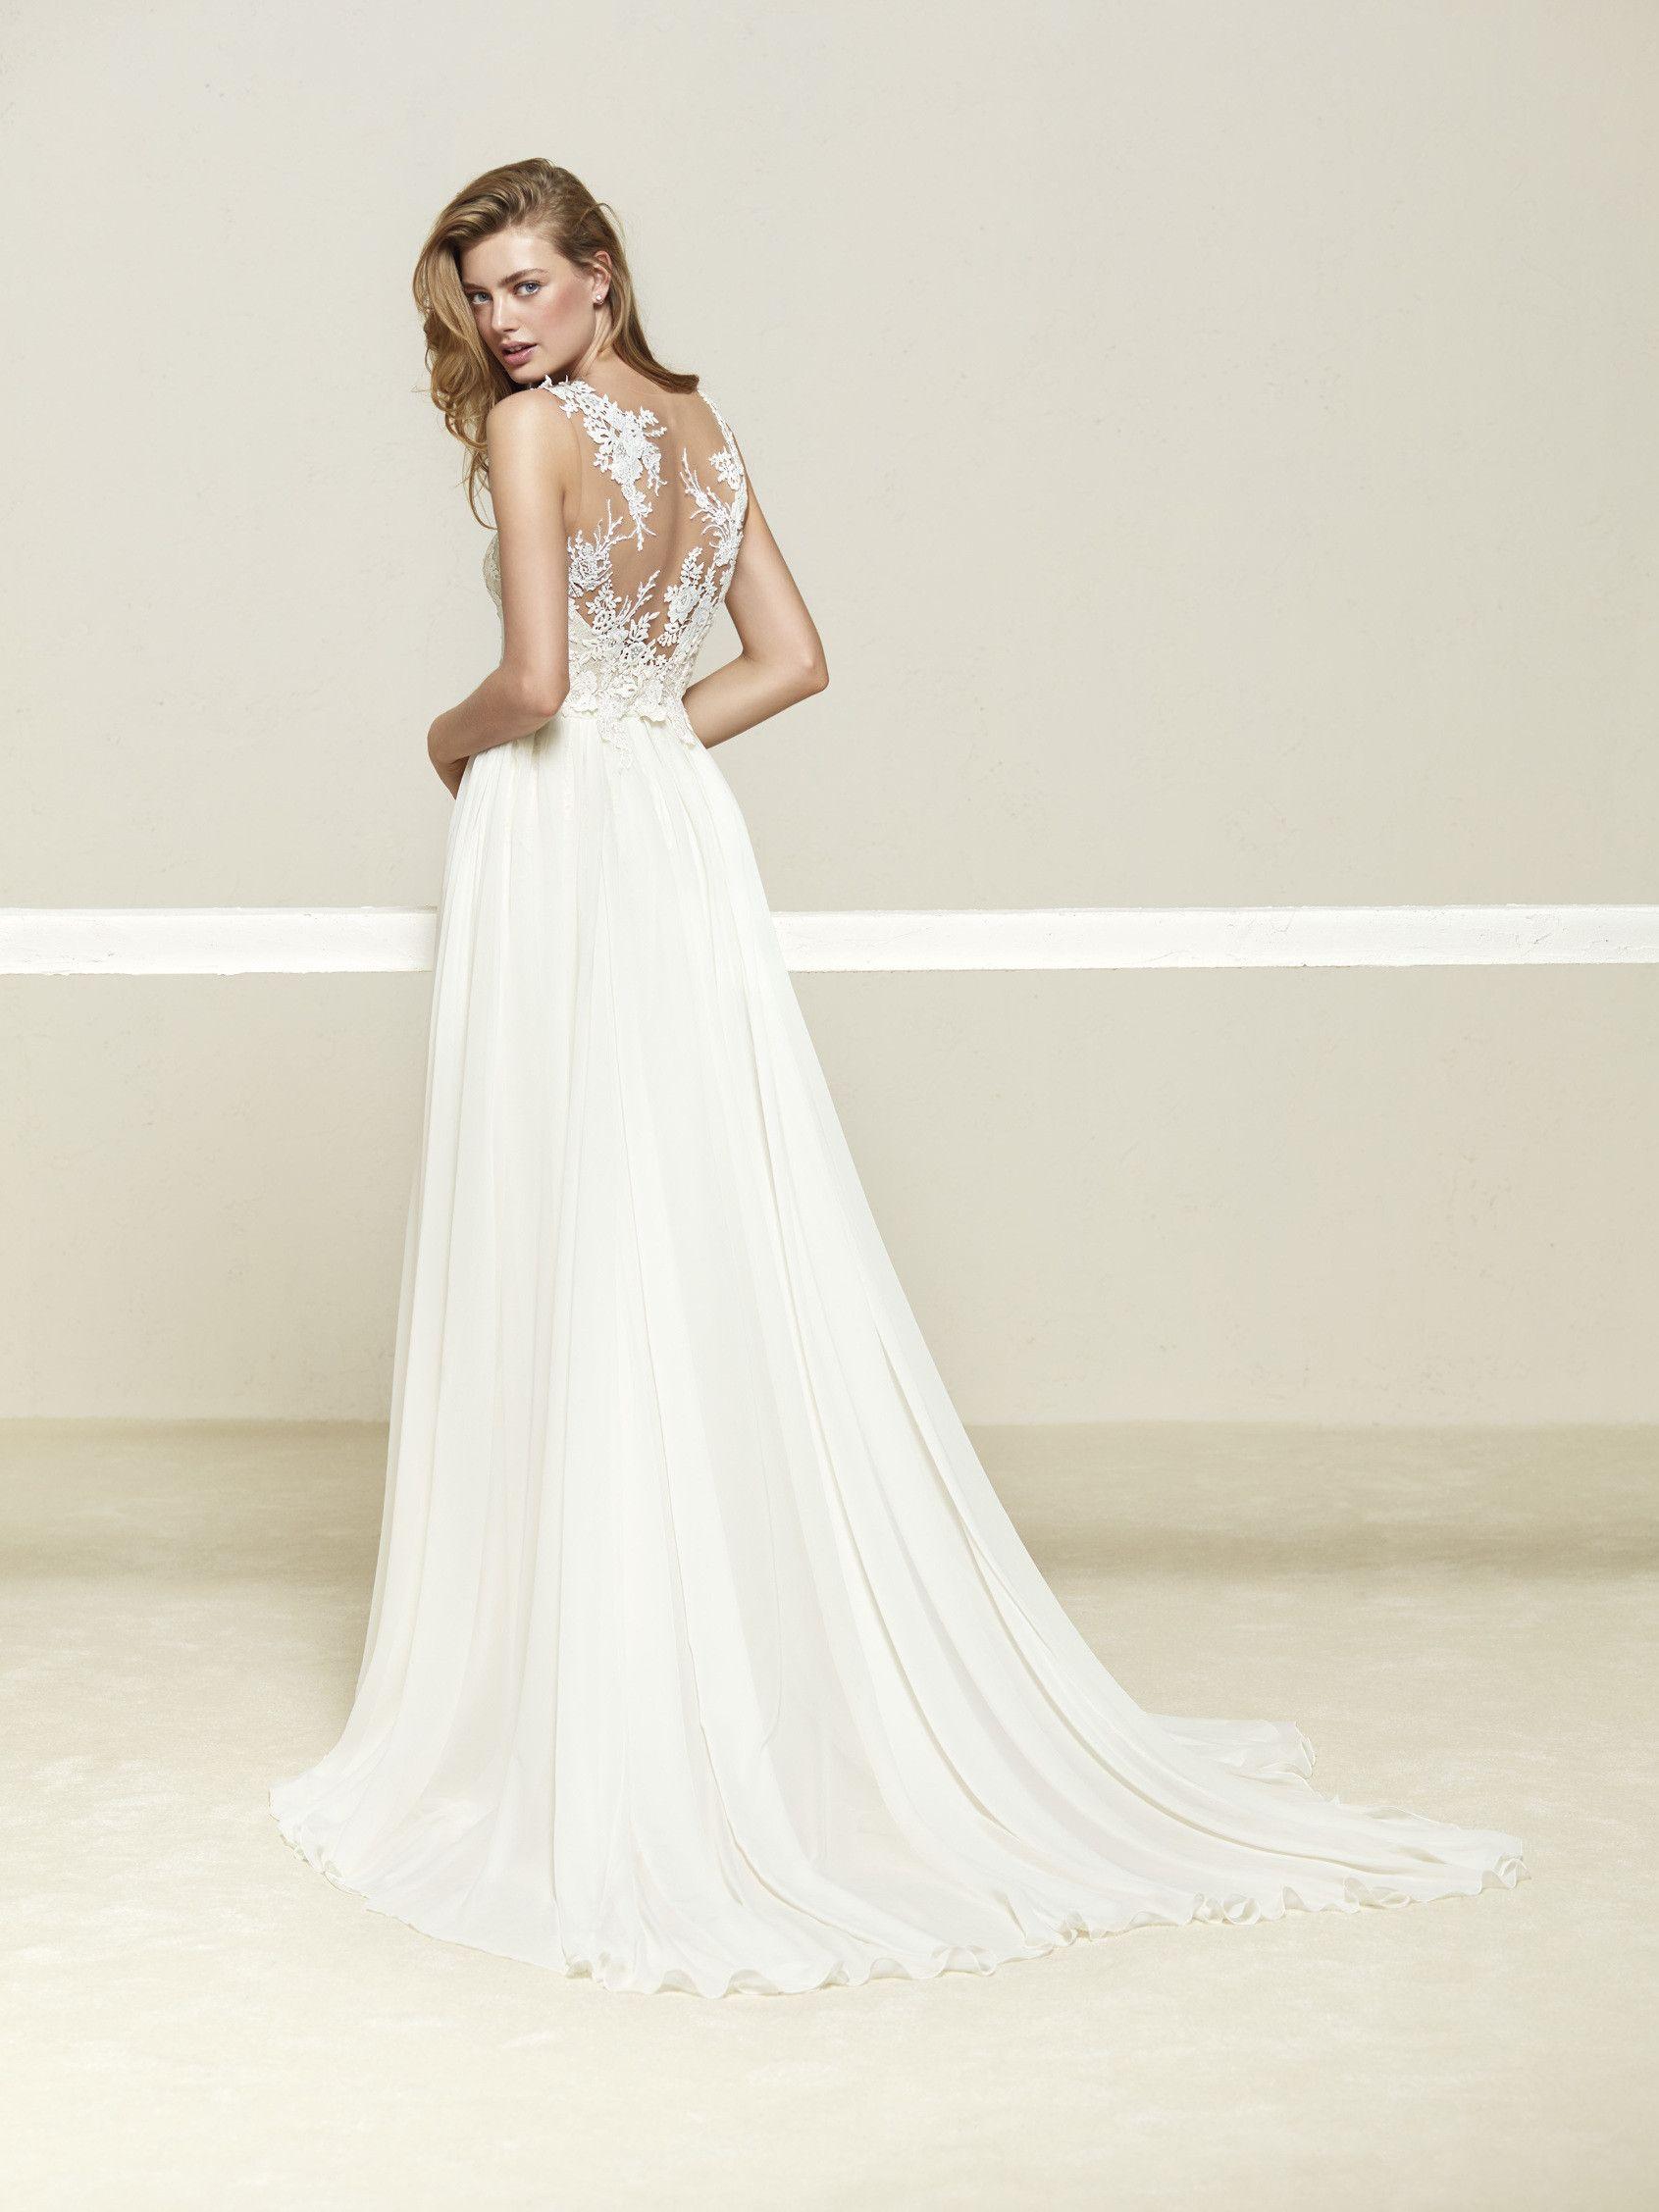 Wedding dress with beautiful layered skirt Drepea Pronovias